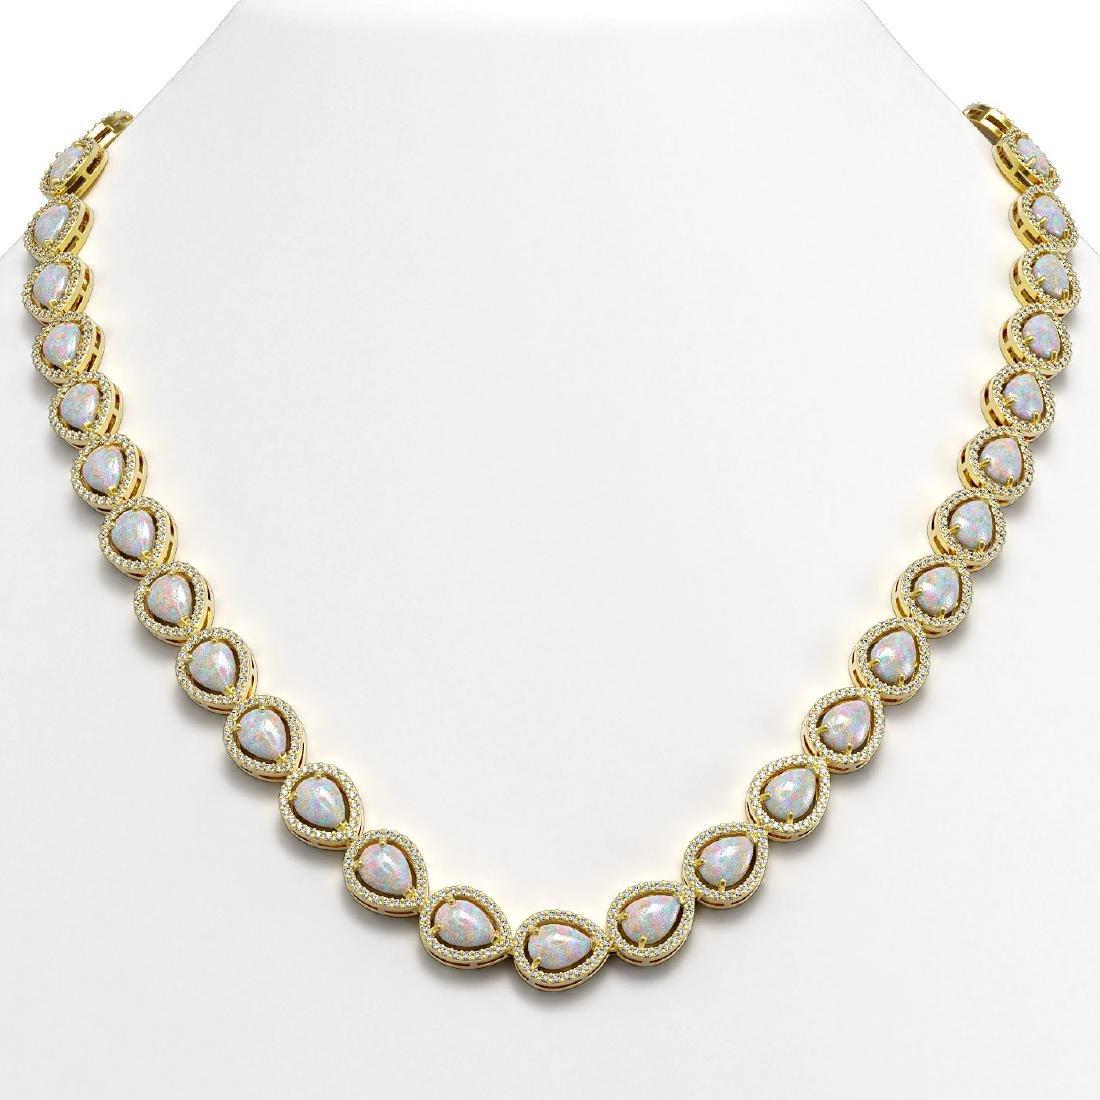 27.93 CTW Opal & Diamond Halo Necklace 10K Yellow Gold